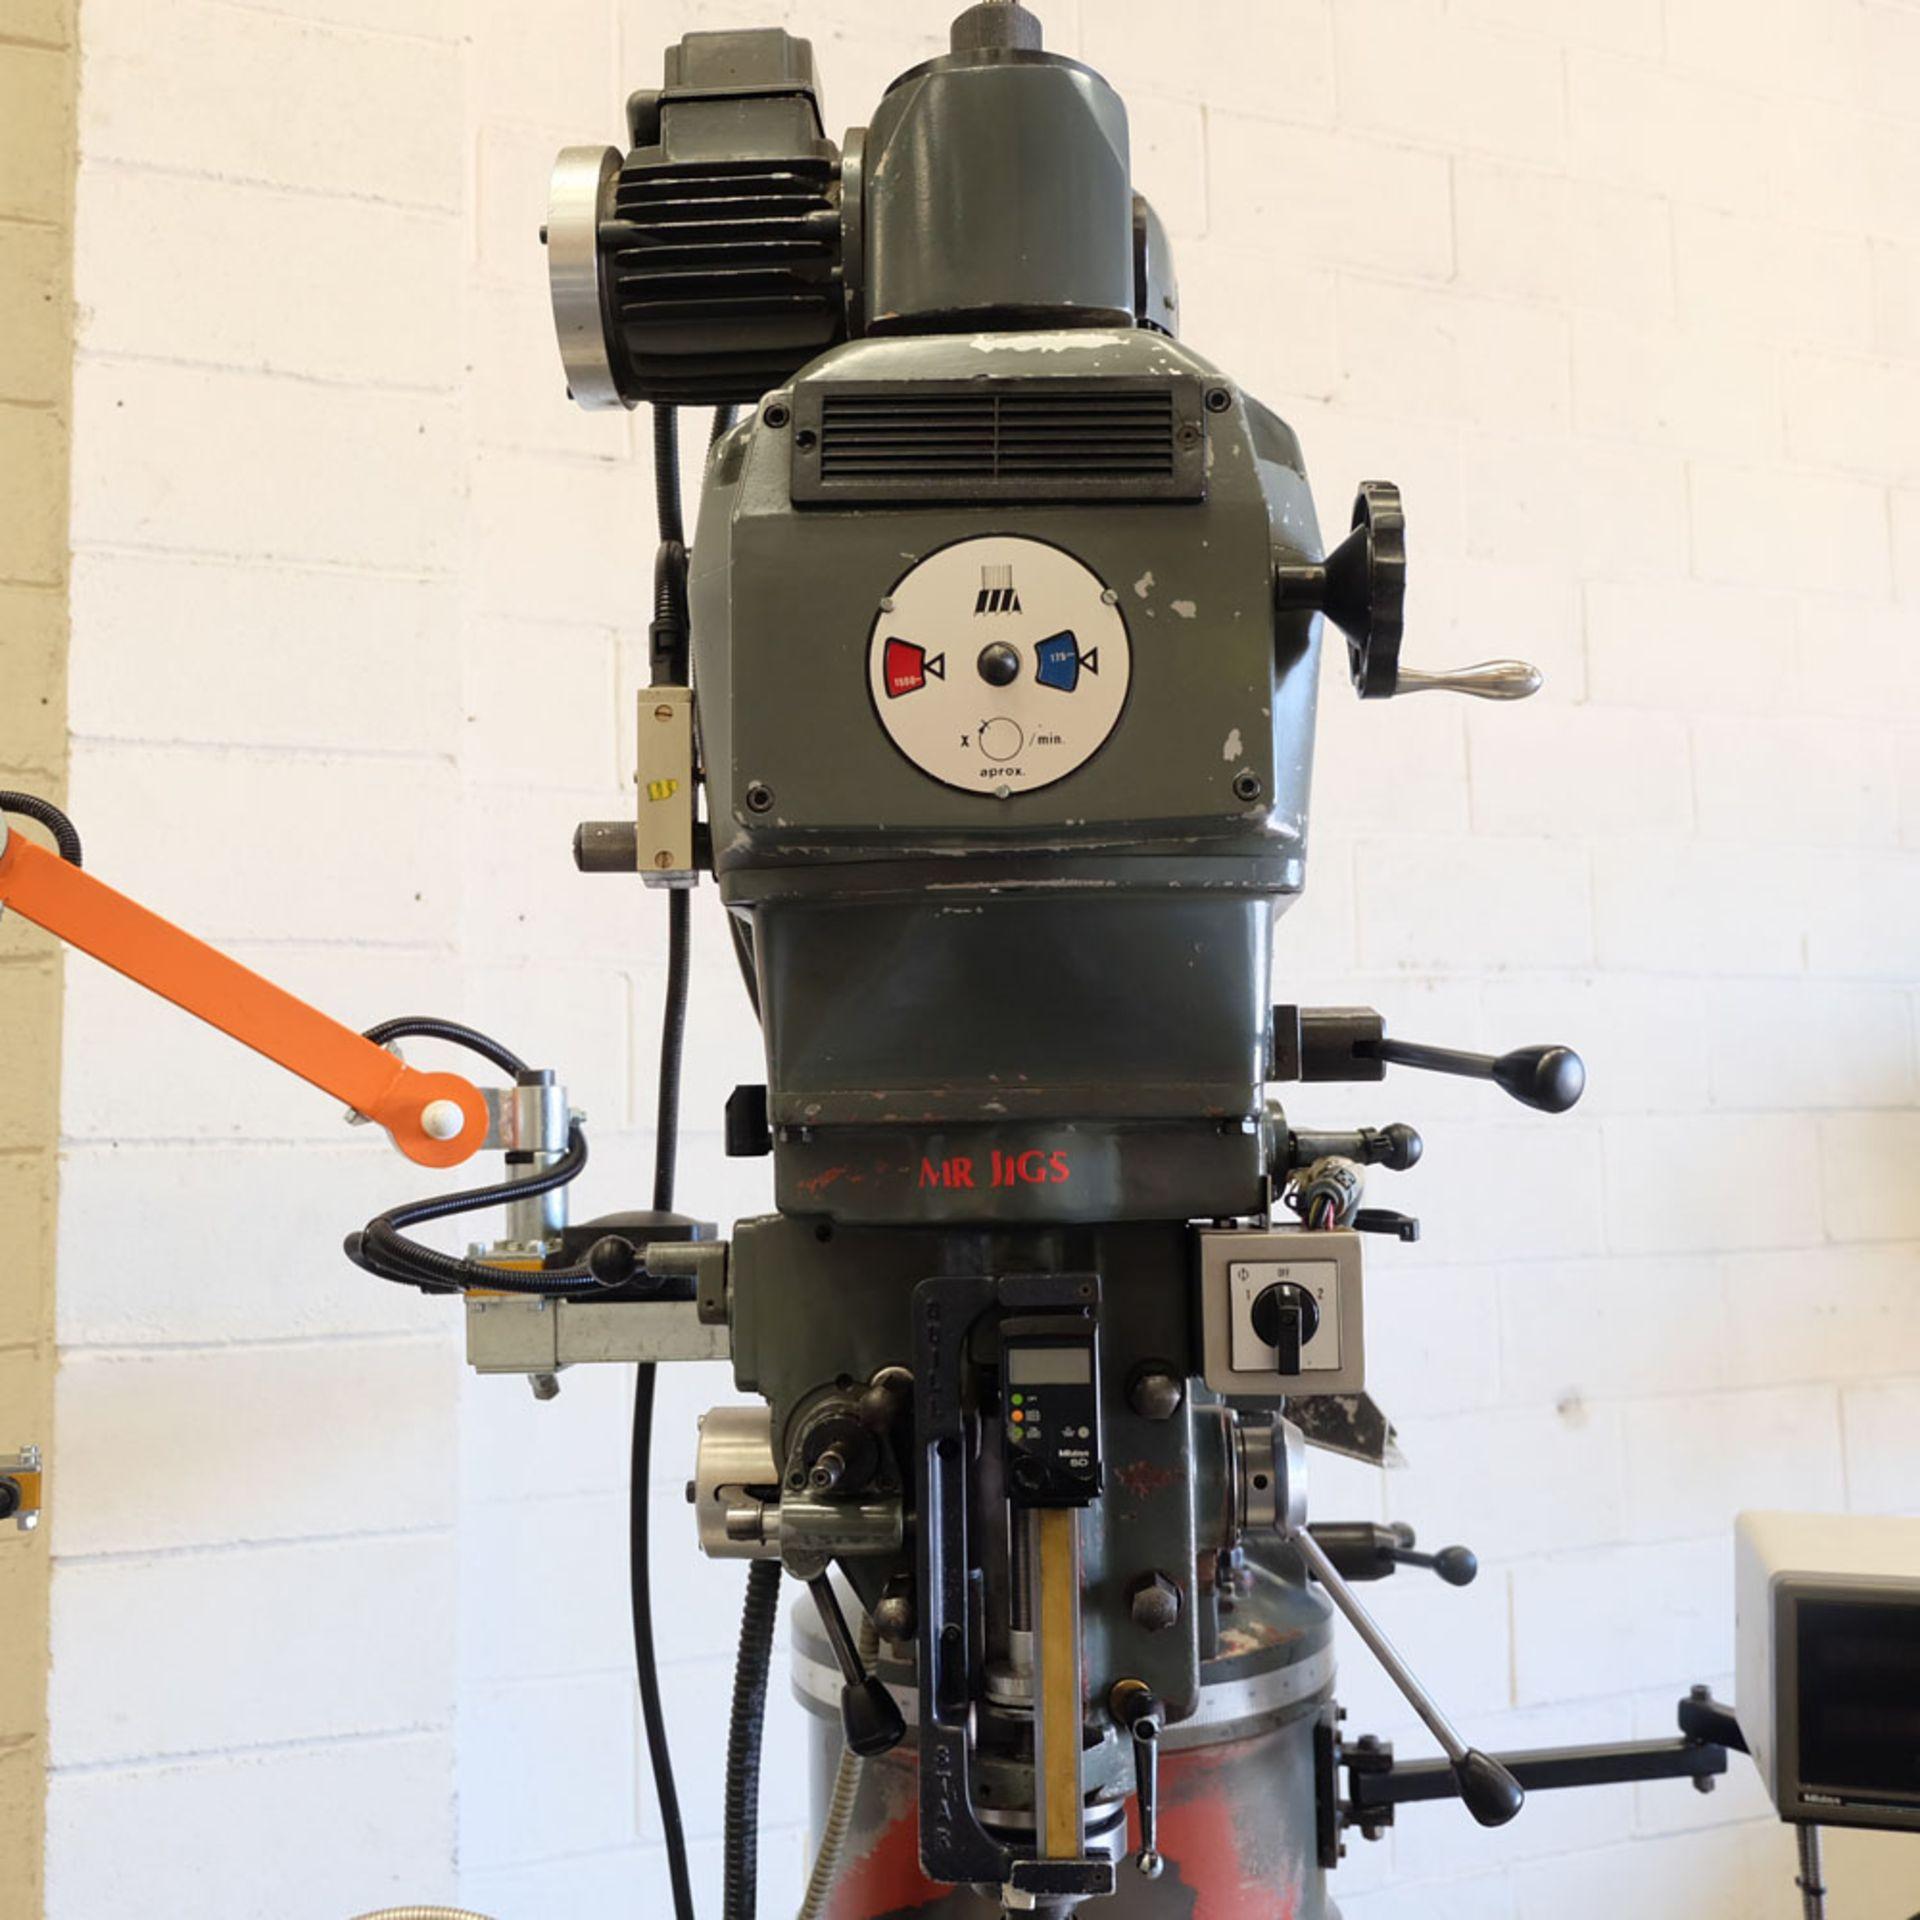 AJAX Model AJT.4 Turret Milling Machine. Table Size: 1372 x 280mm. - Image 3 of 8